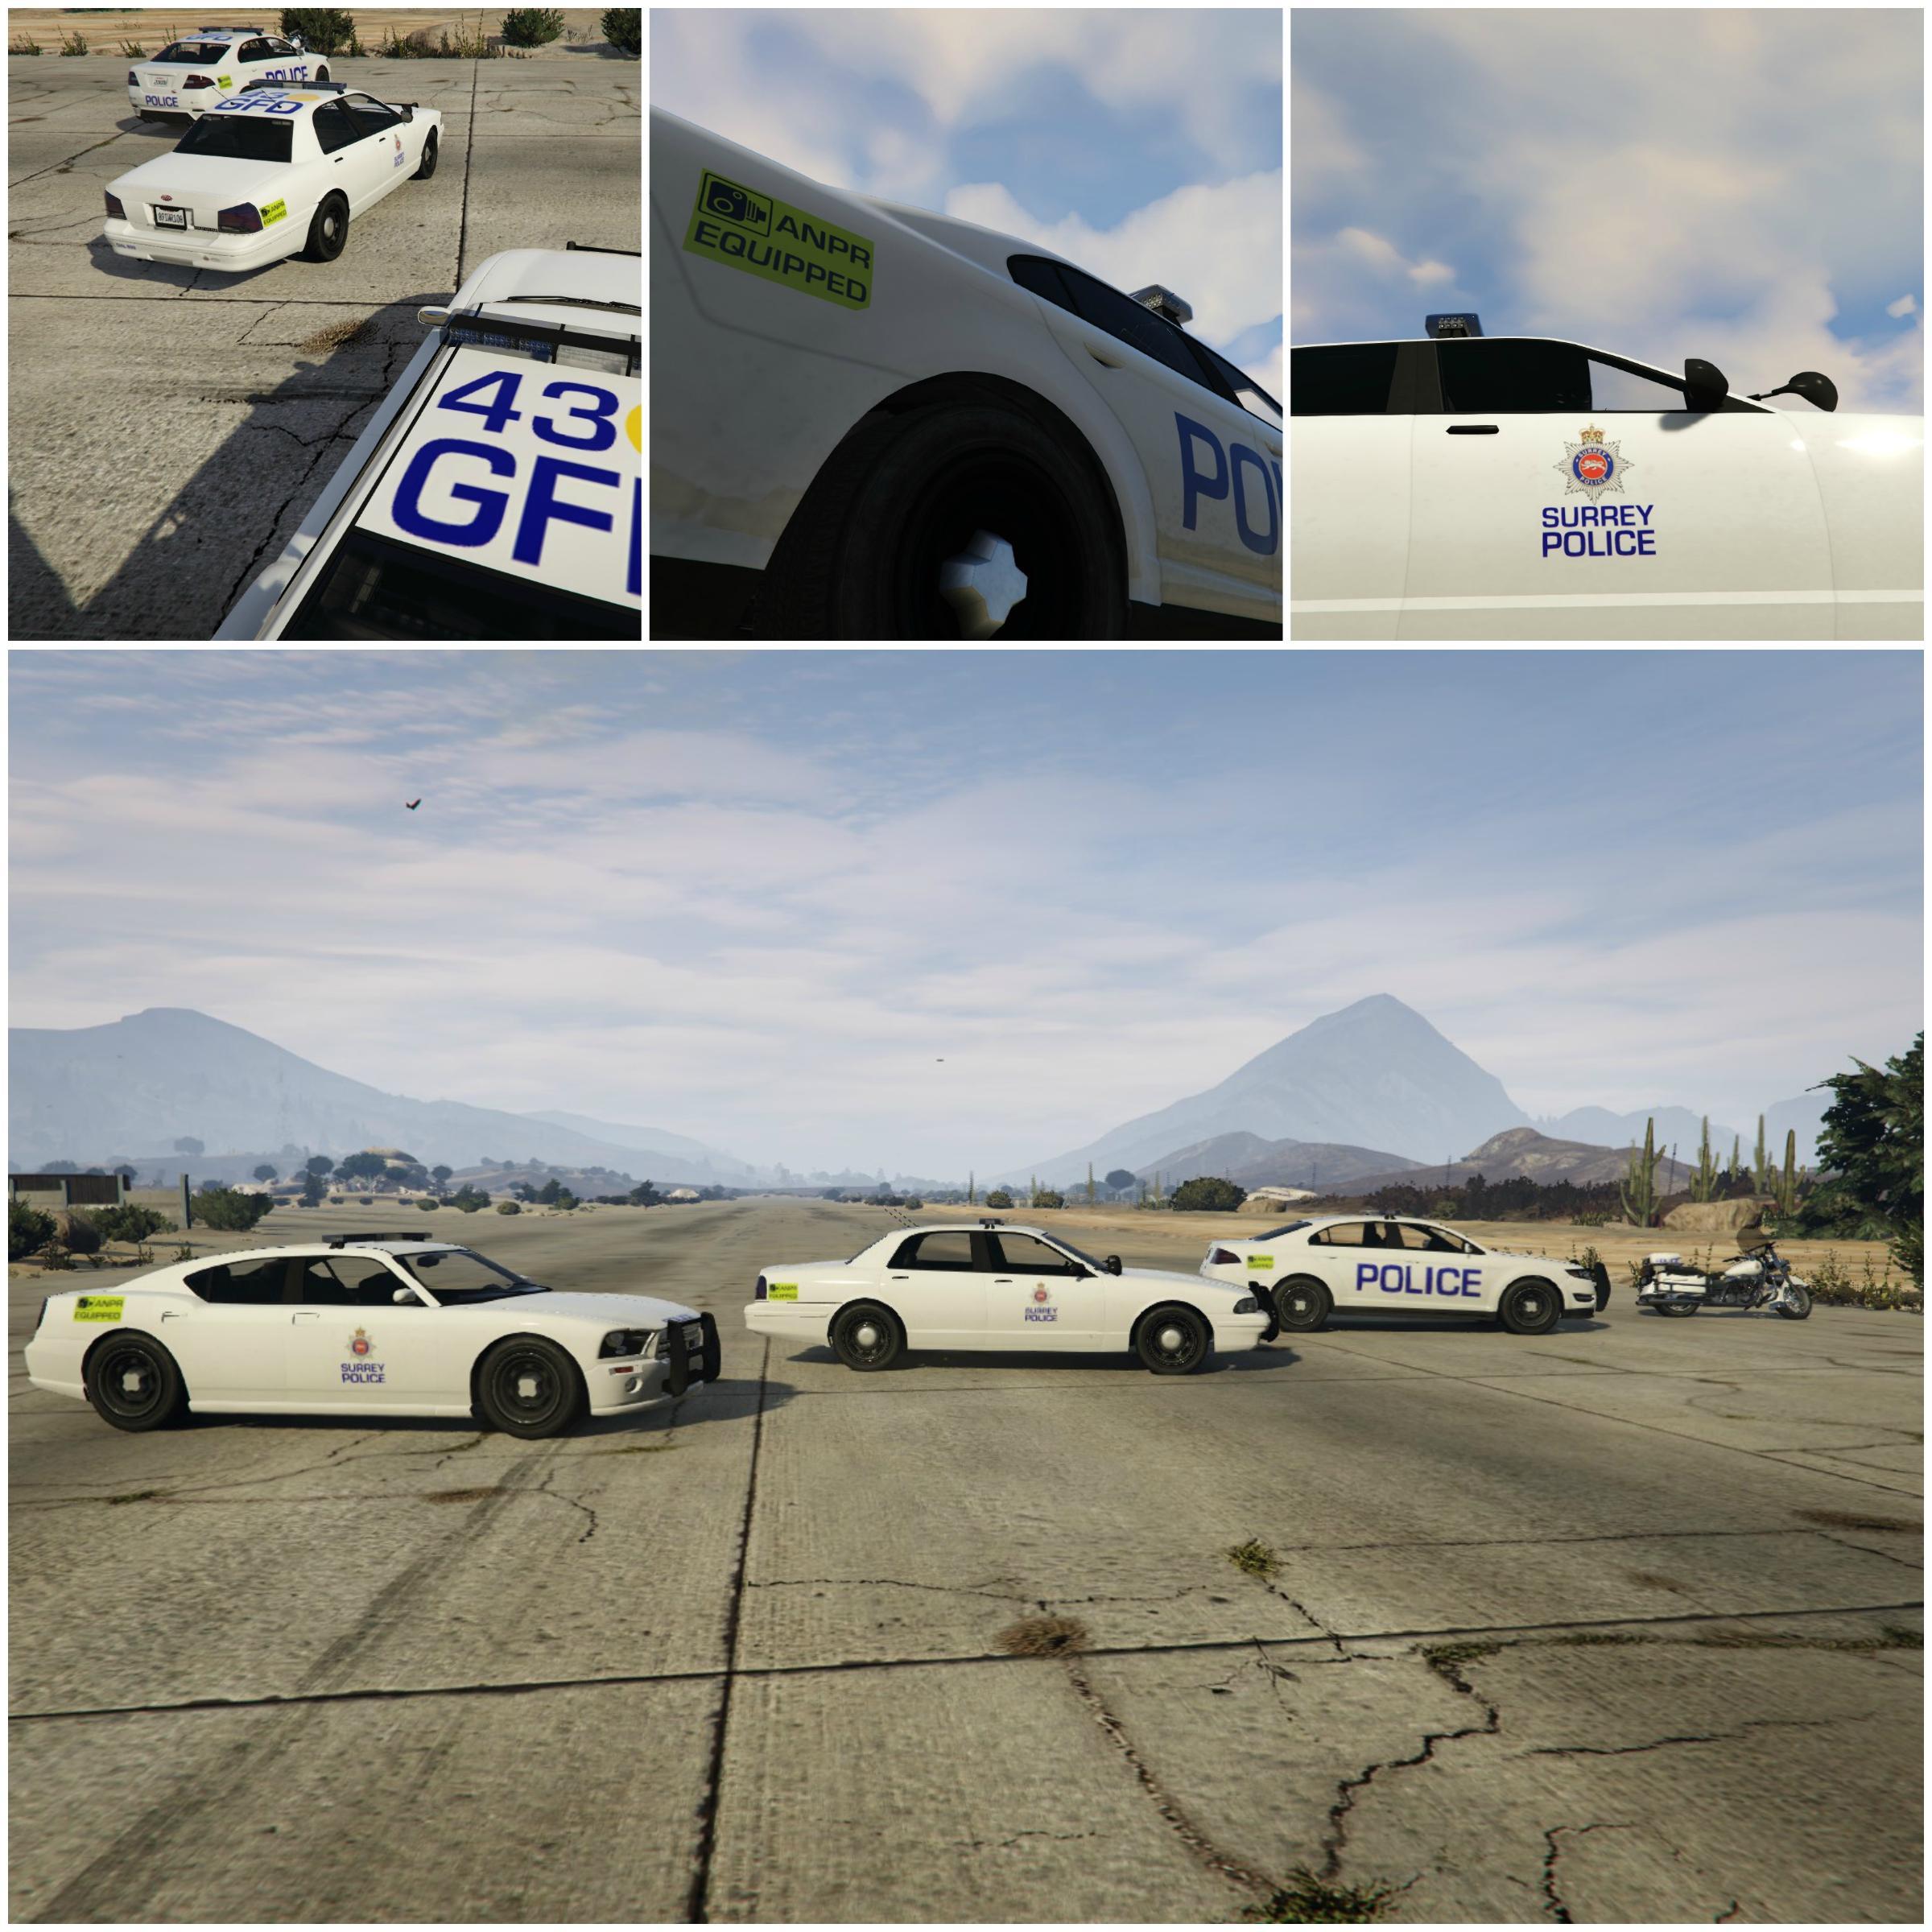 British Surrey Police Cars